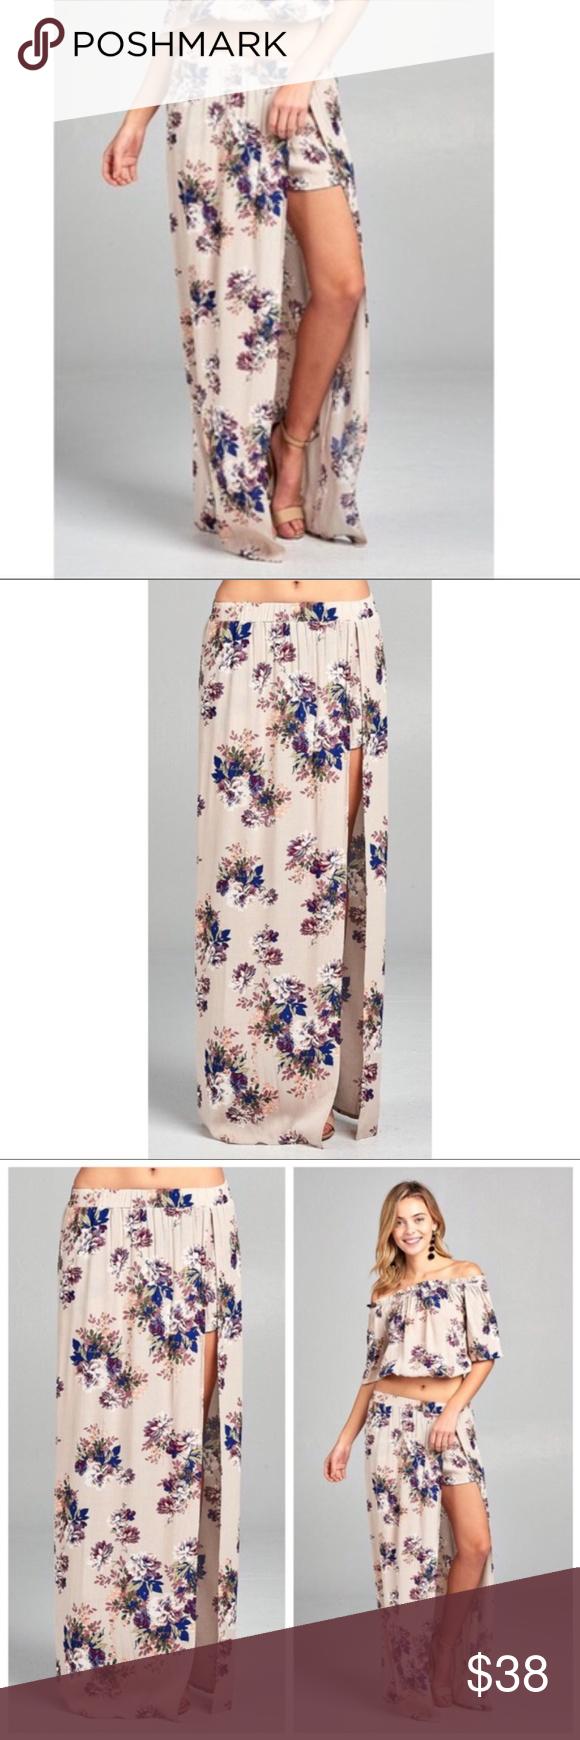 Hpfloral maxi skirt wshorts boutique my posh picks